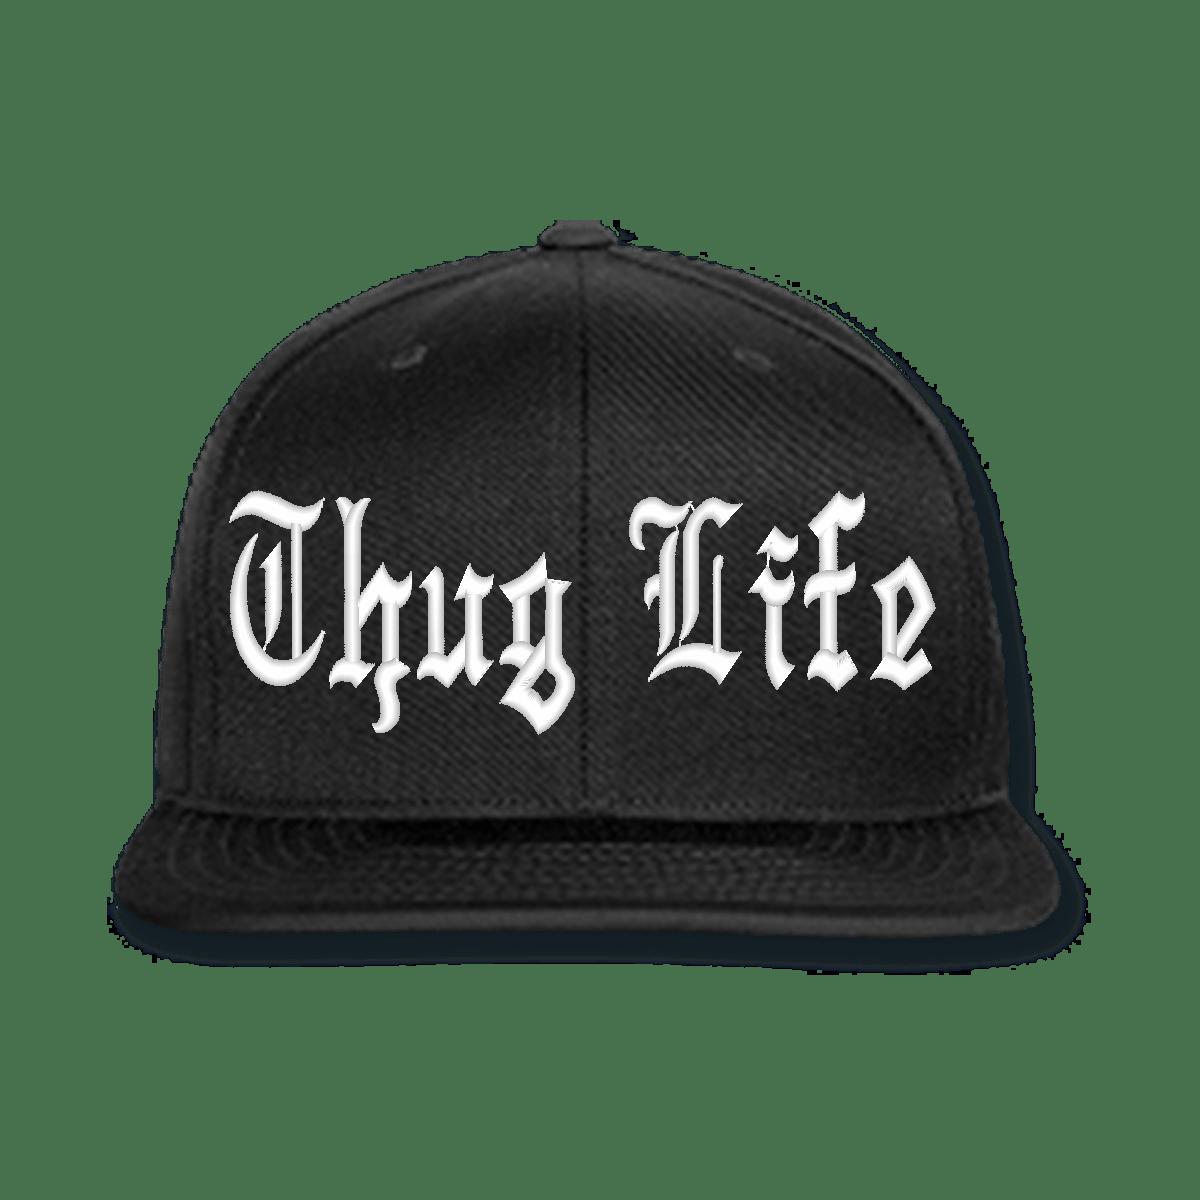 Sideways baseball cap clipart jpg stock Thug Life Black Cap transparent PNG - StickPNG jpg stock